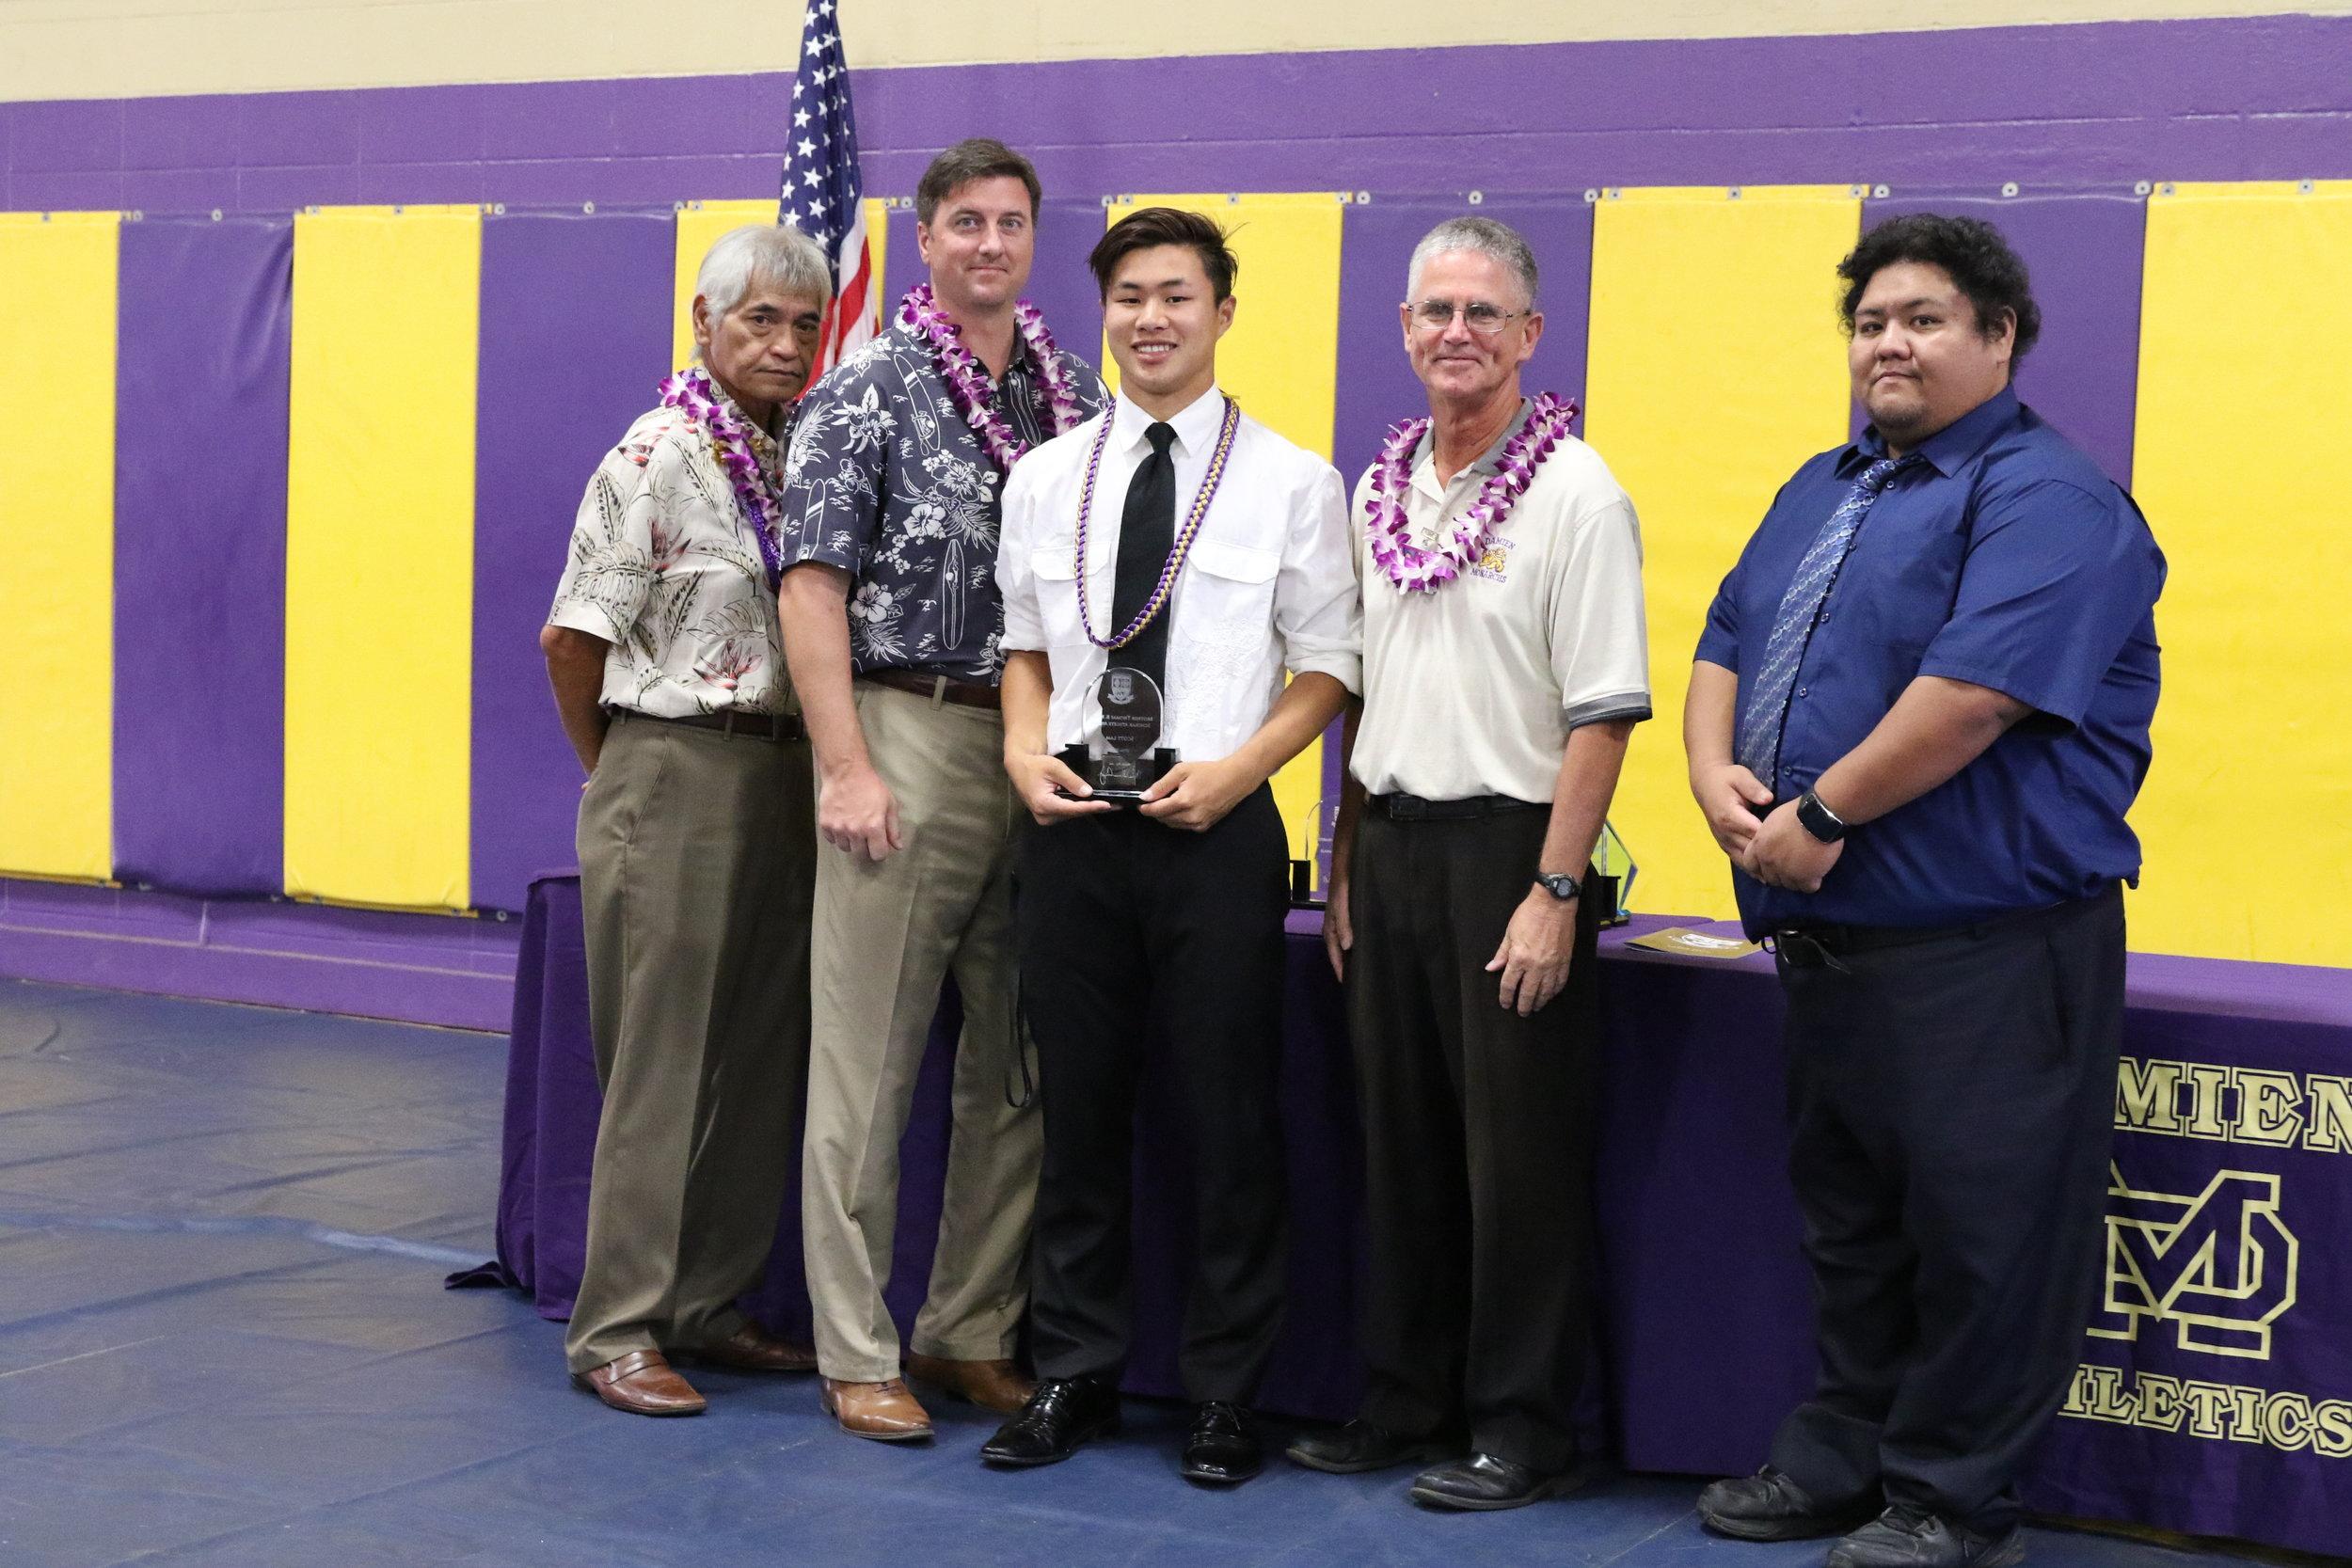 Brother Thomas B. Regan Scholar Athlete Award